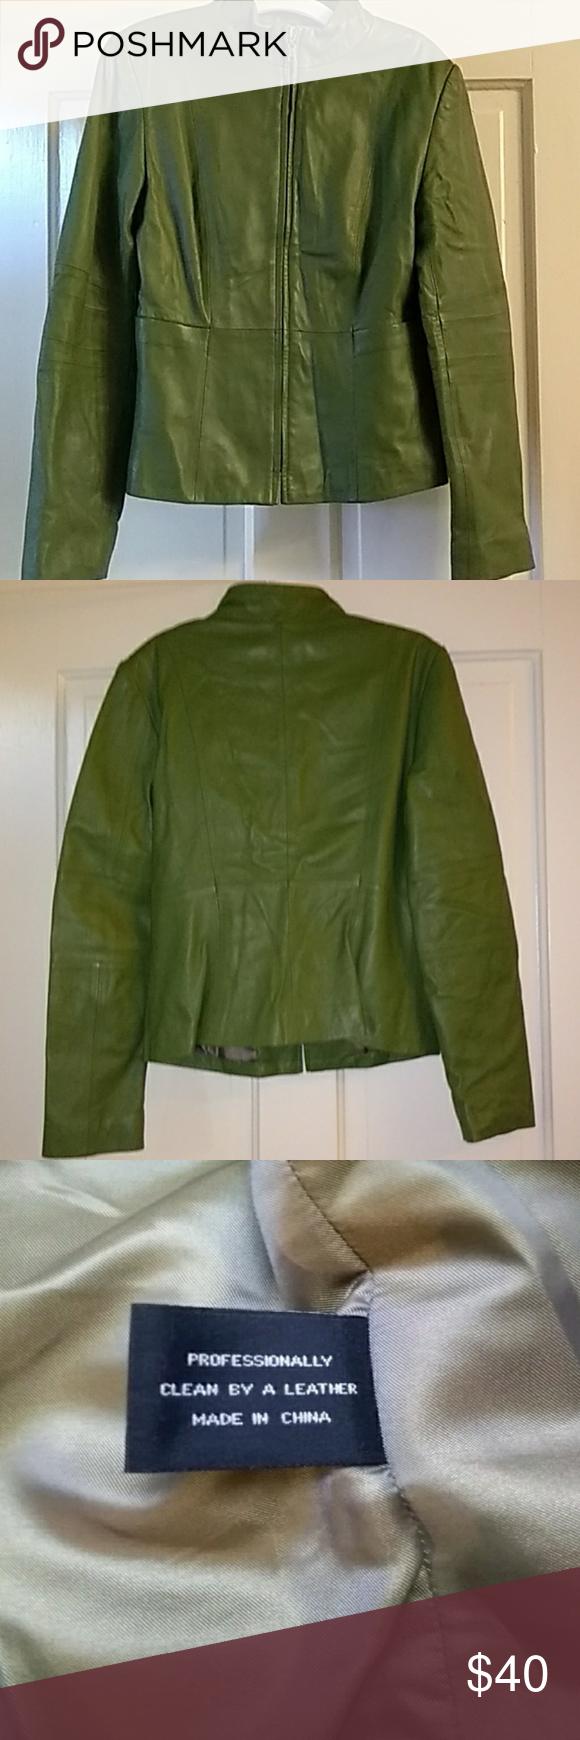 Spring Green Leather Jacket A Beautiful Olive Green Zion New York Jacket Euc Zipper Closing And Has Pocket Green Leather Jackets Green Leather Leather Jacket [ 1740 x 580 Pixel ]